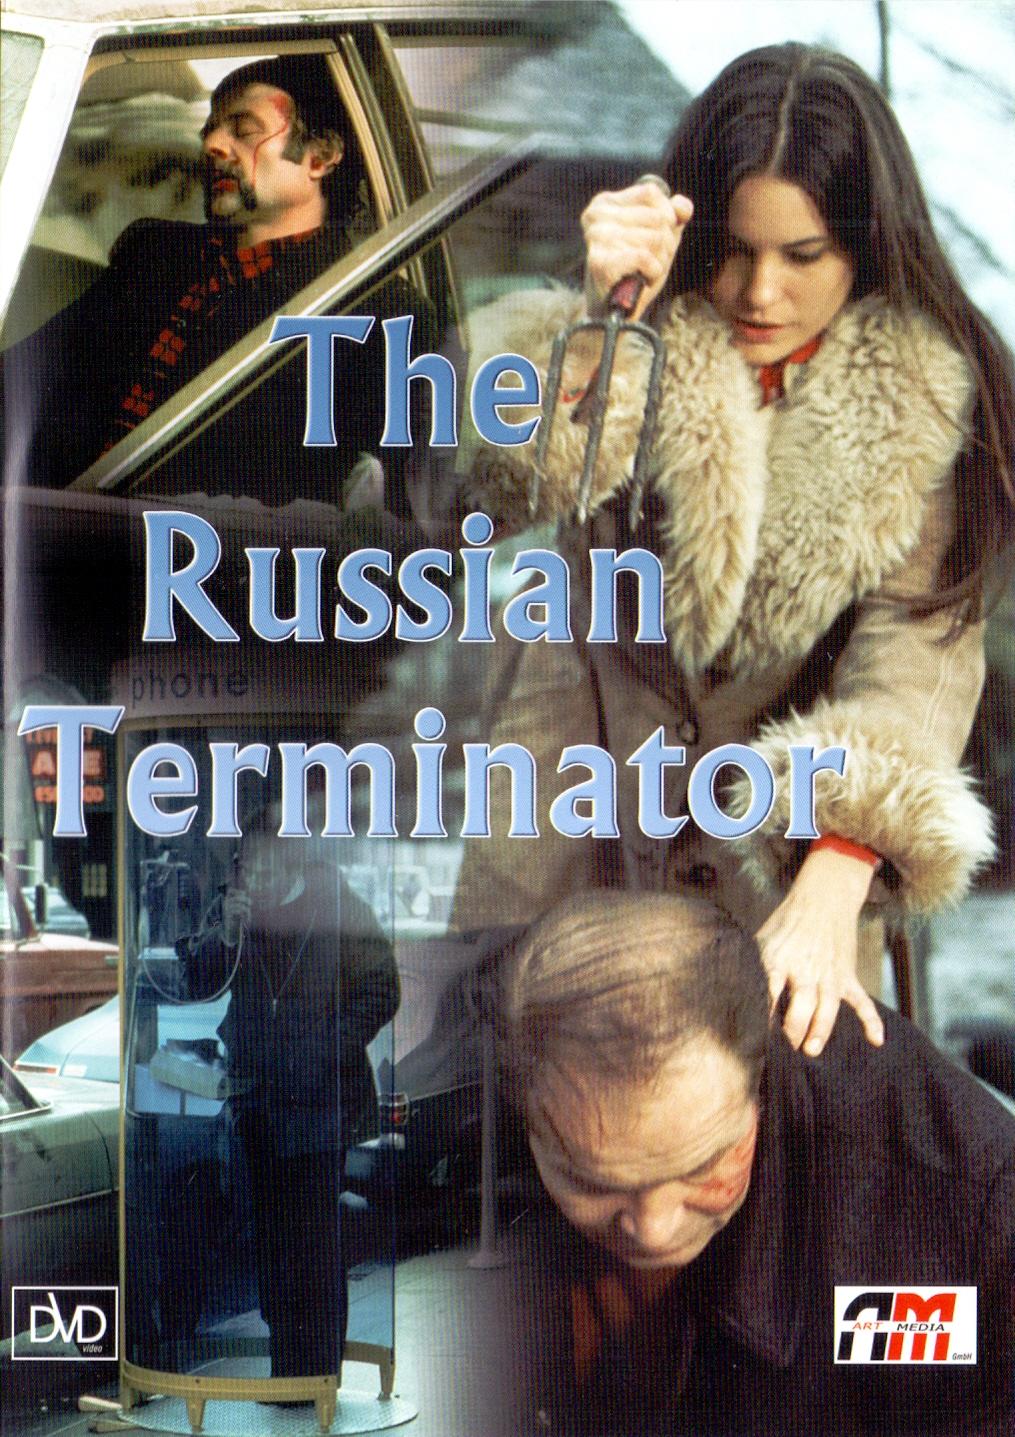 The Russian Terminator